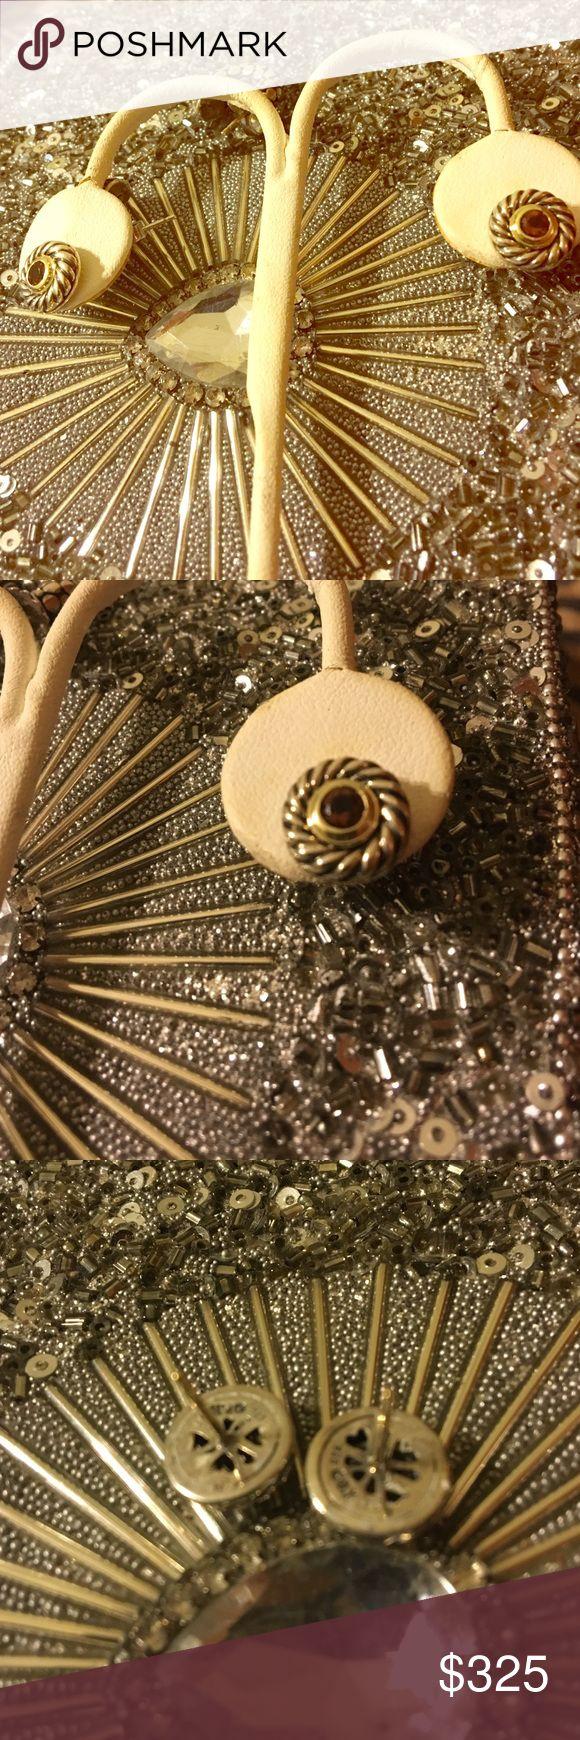 David Yurman citrine 18 karat and Sterling Citrine stone 18 karat gold and sterling David Yurman Jewelry Earrings